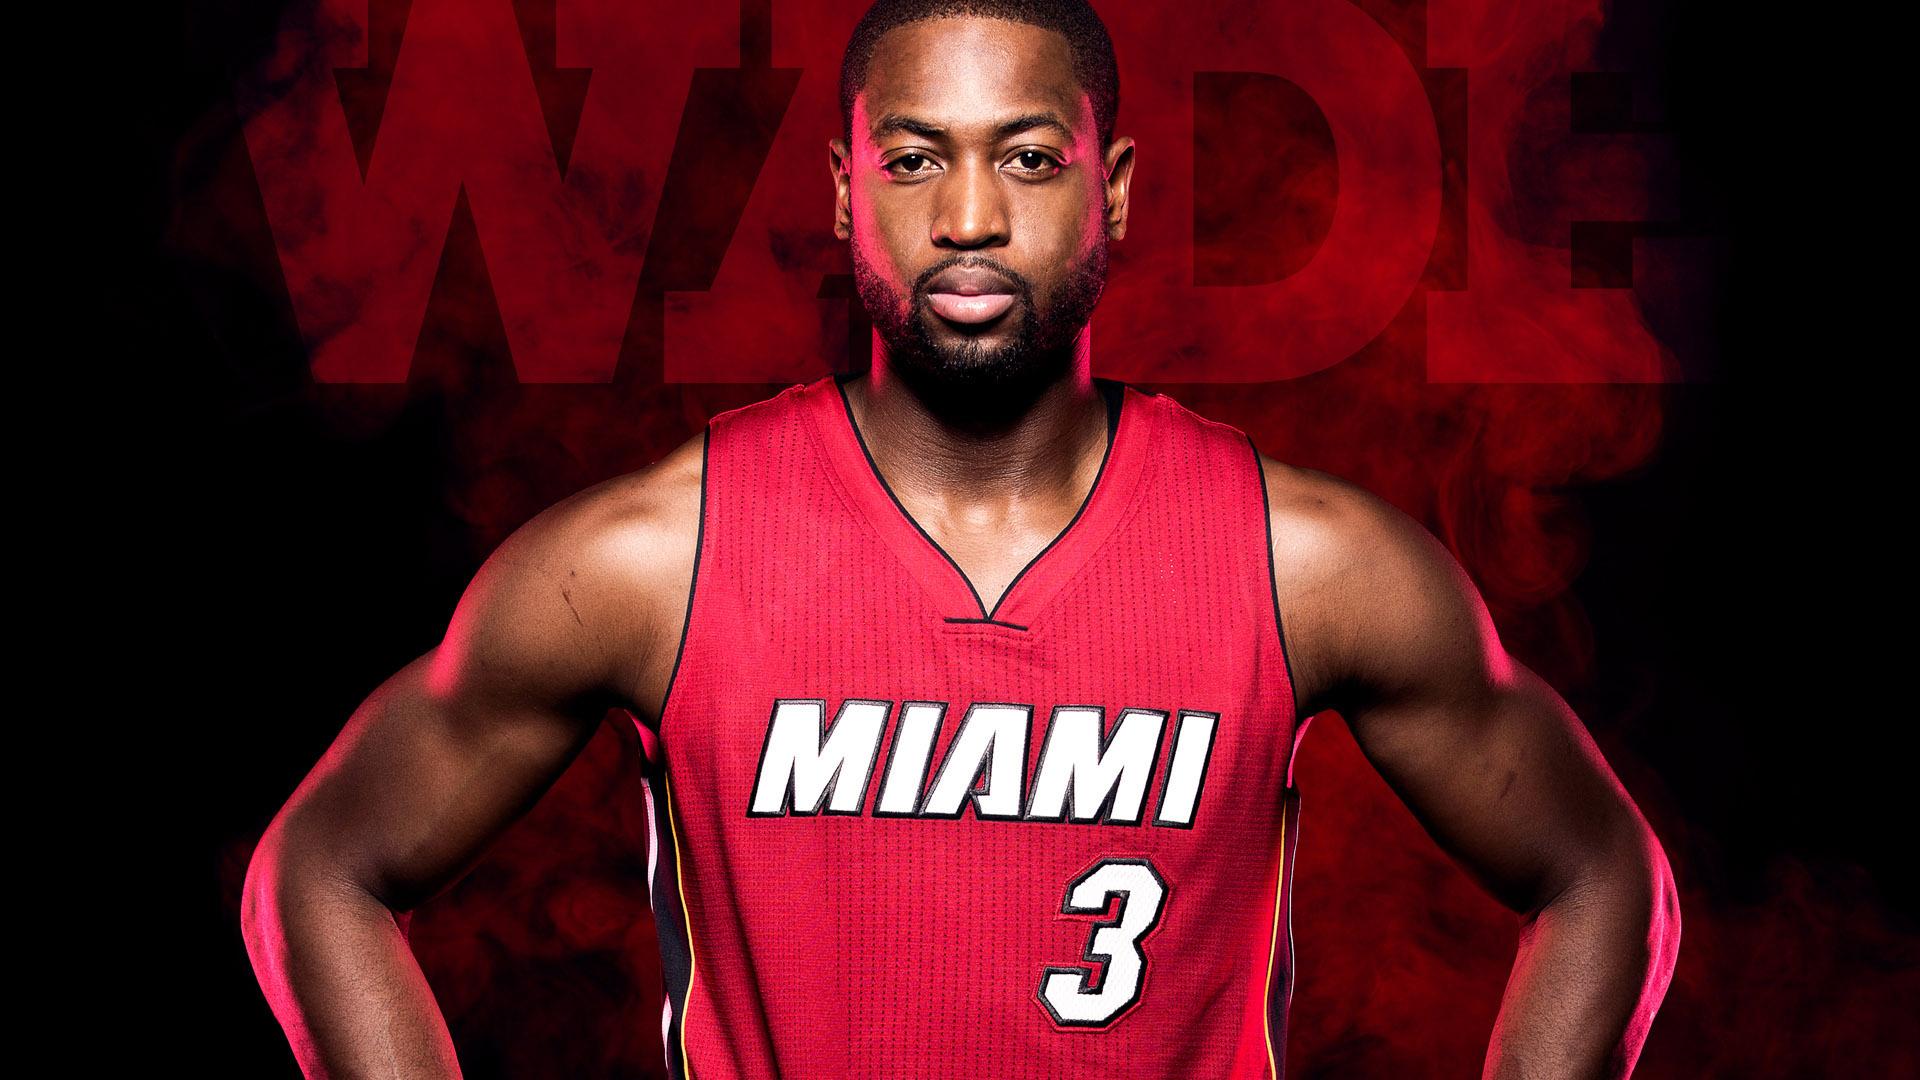 ... Dwyane Wade Miami Heat Players Wallpaper ...